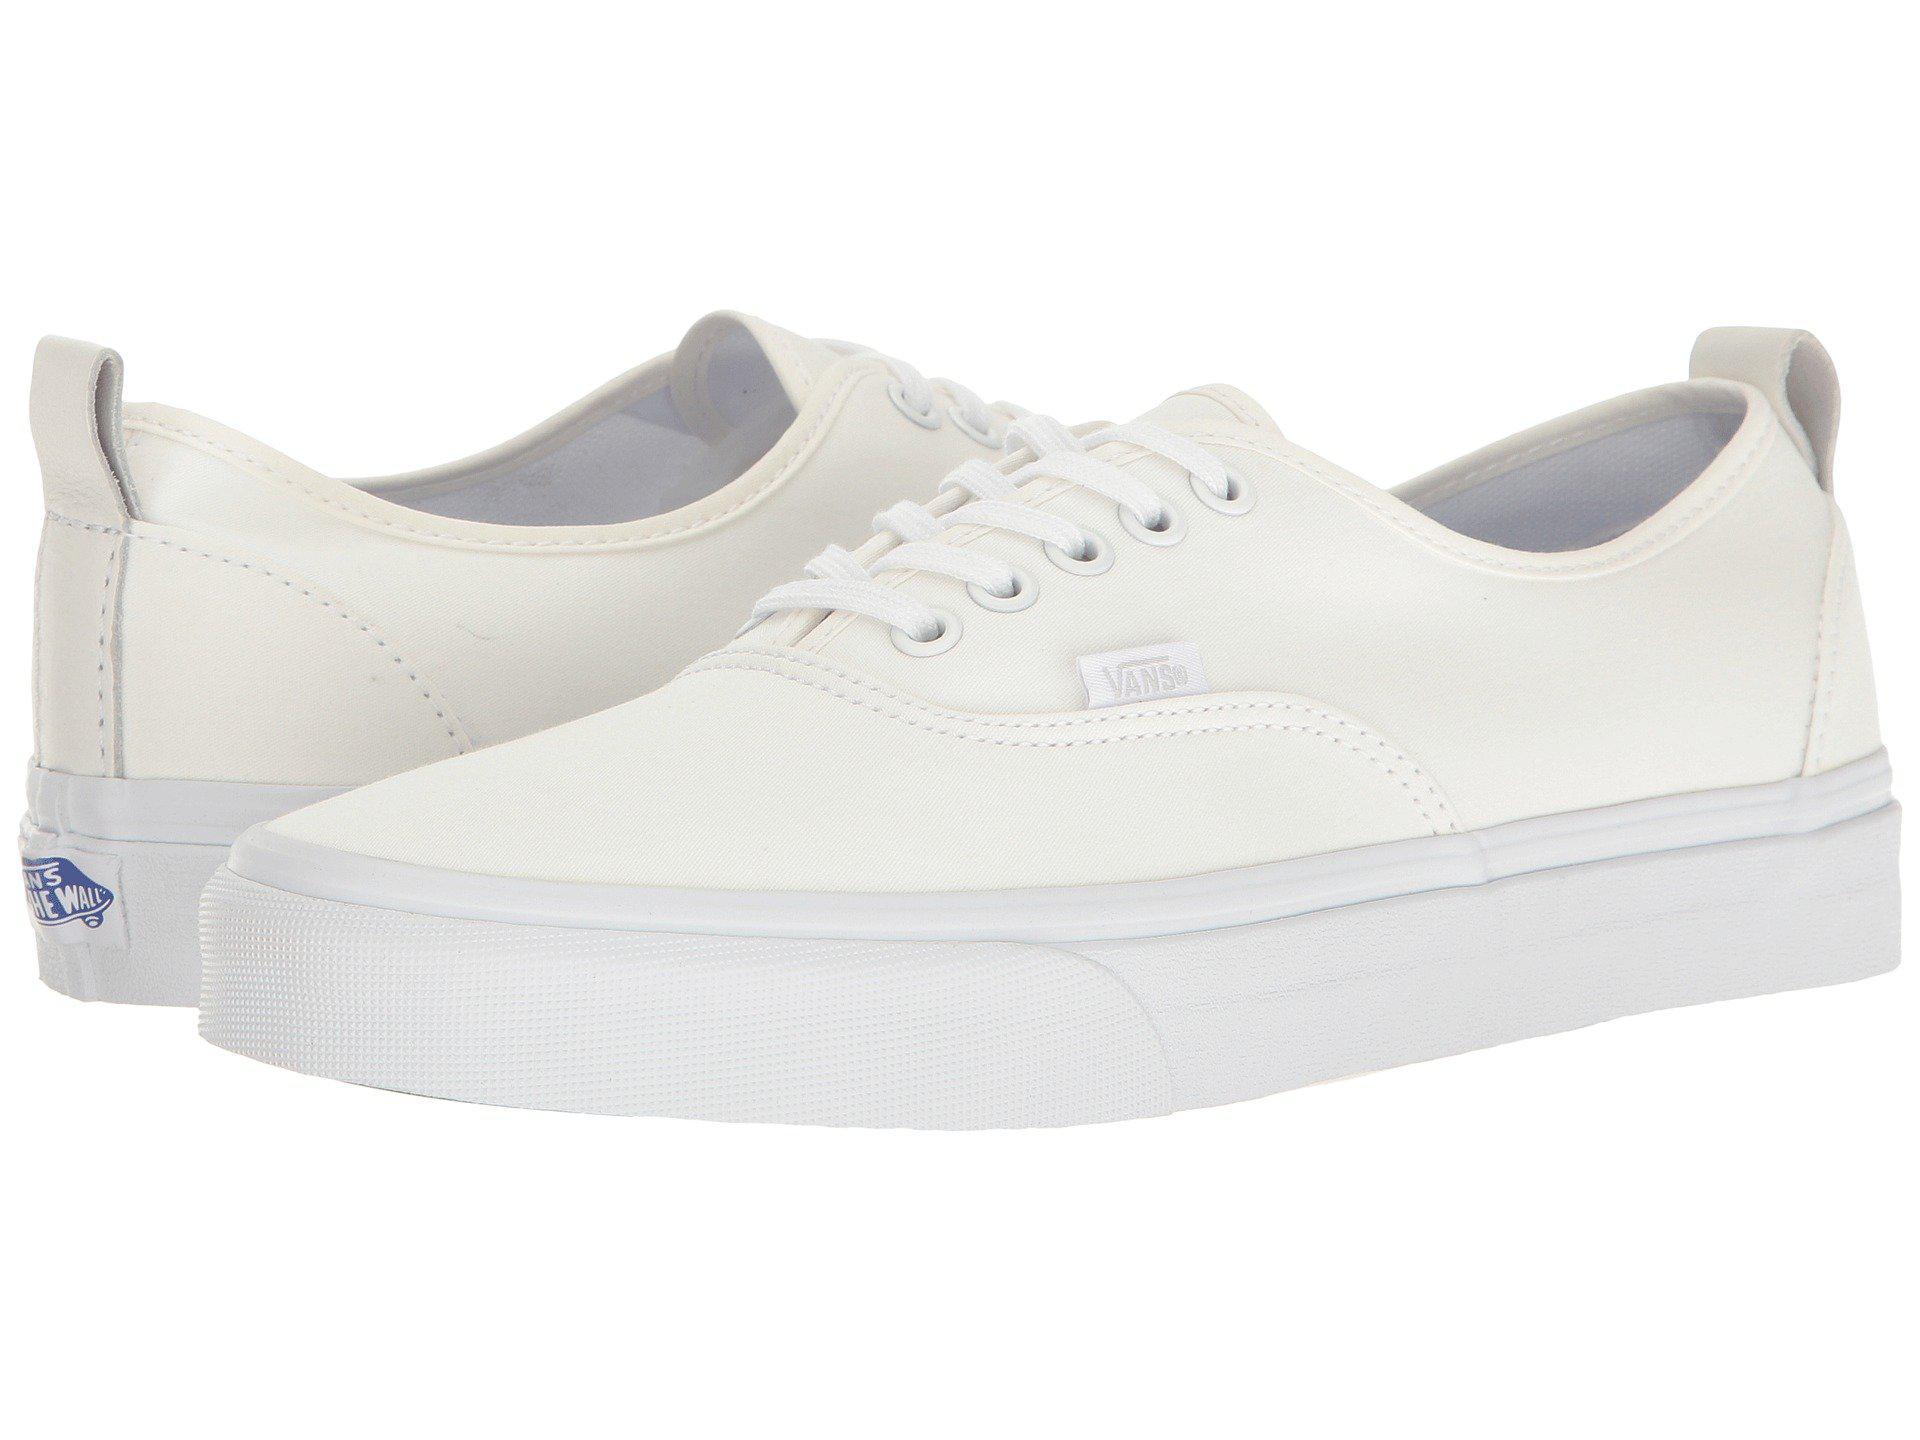 Vans Authentic Pt Sneakers Navy True White - Daftar Harga Terlengkap ... 4db0183f1d